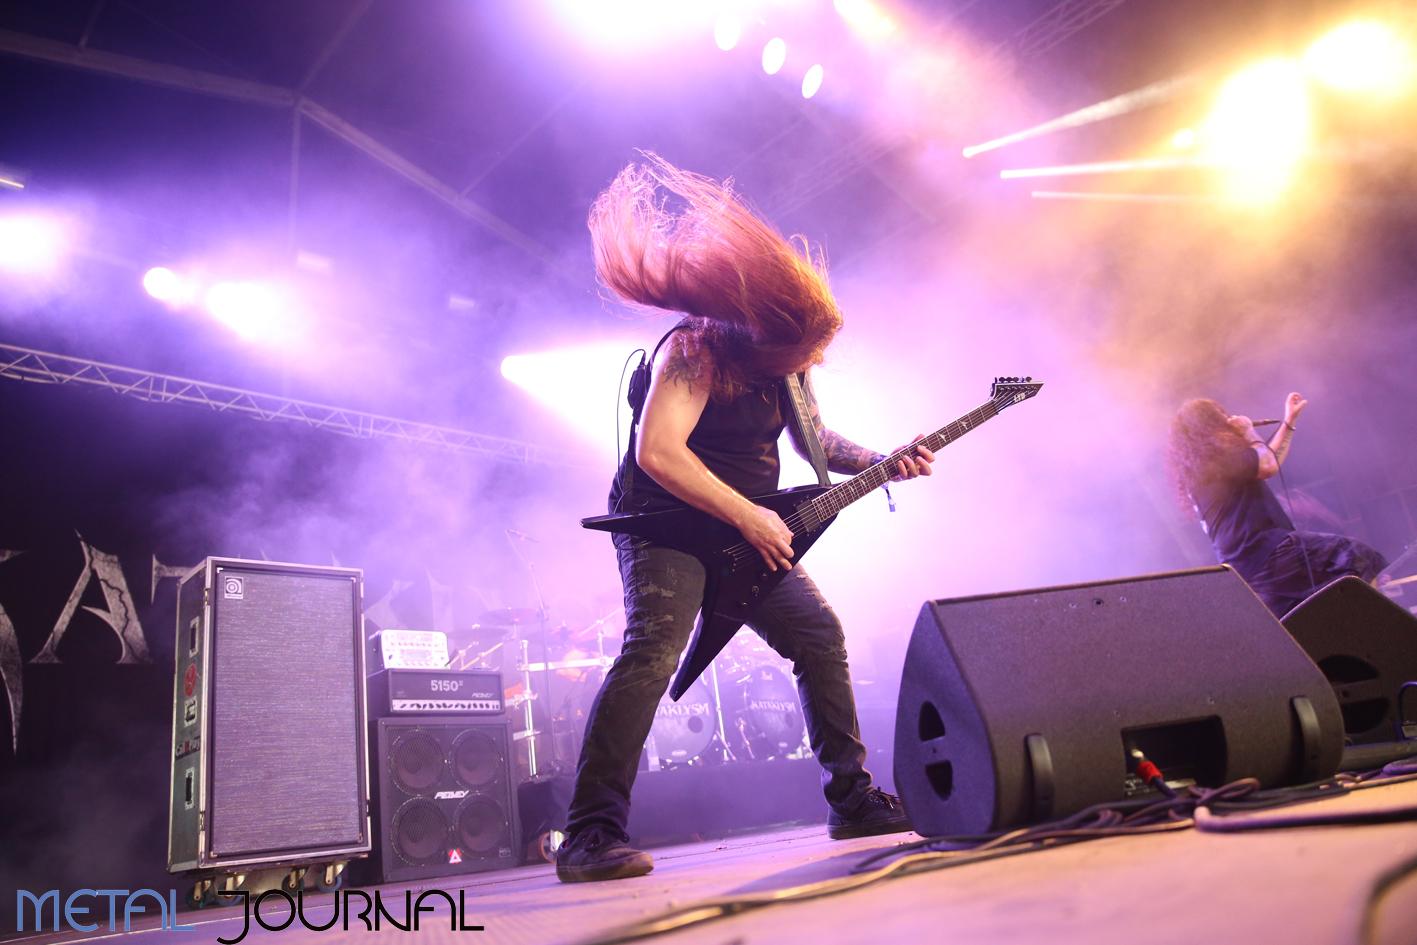 kataklysm rock fest 18 - metal journal pic 2